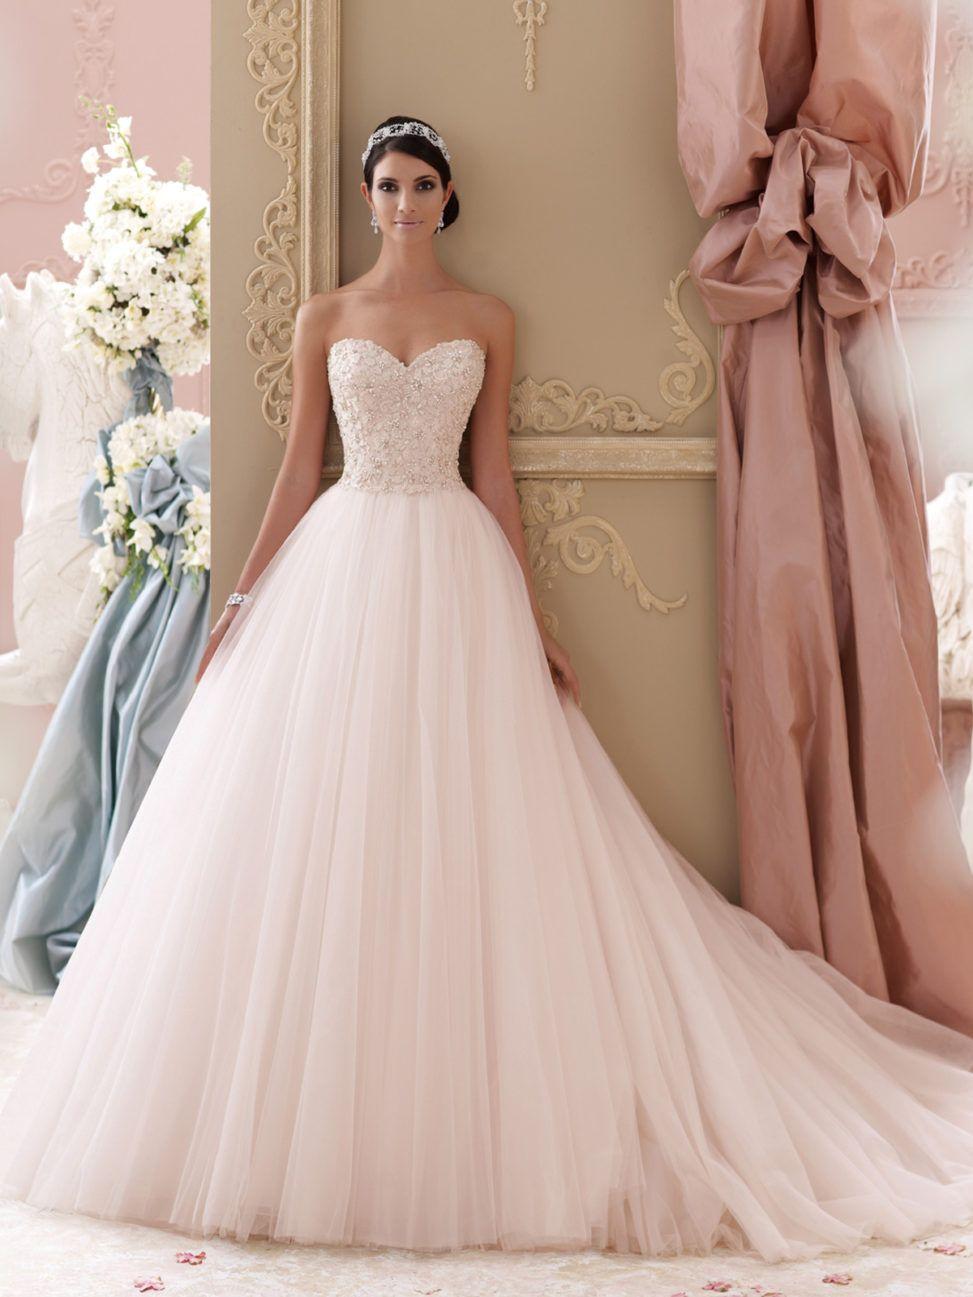 Gorgeous ball gown wedding dresses girlyard wedding